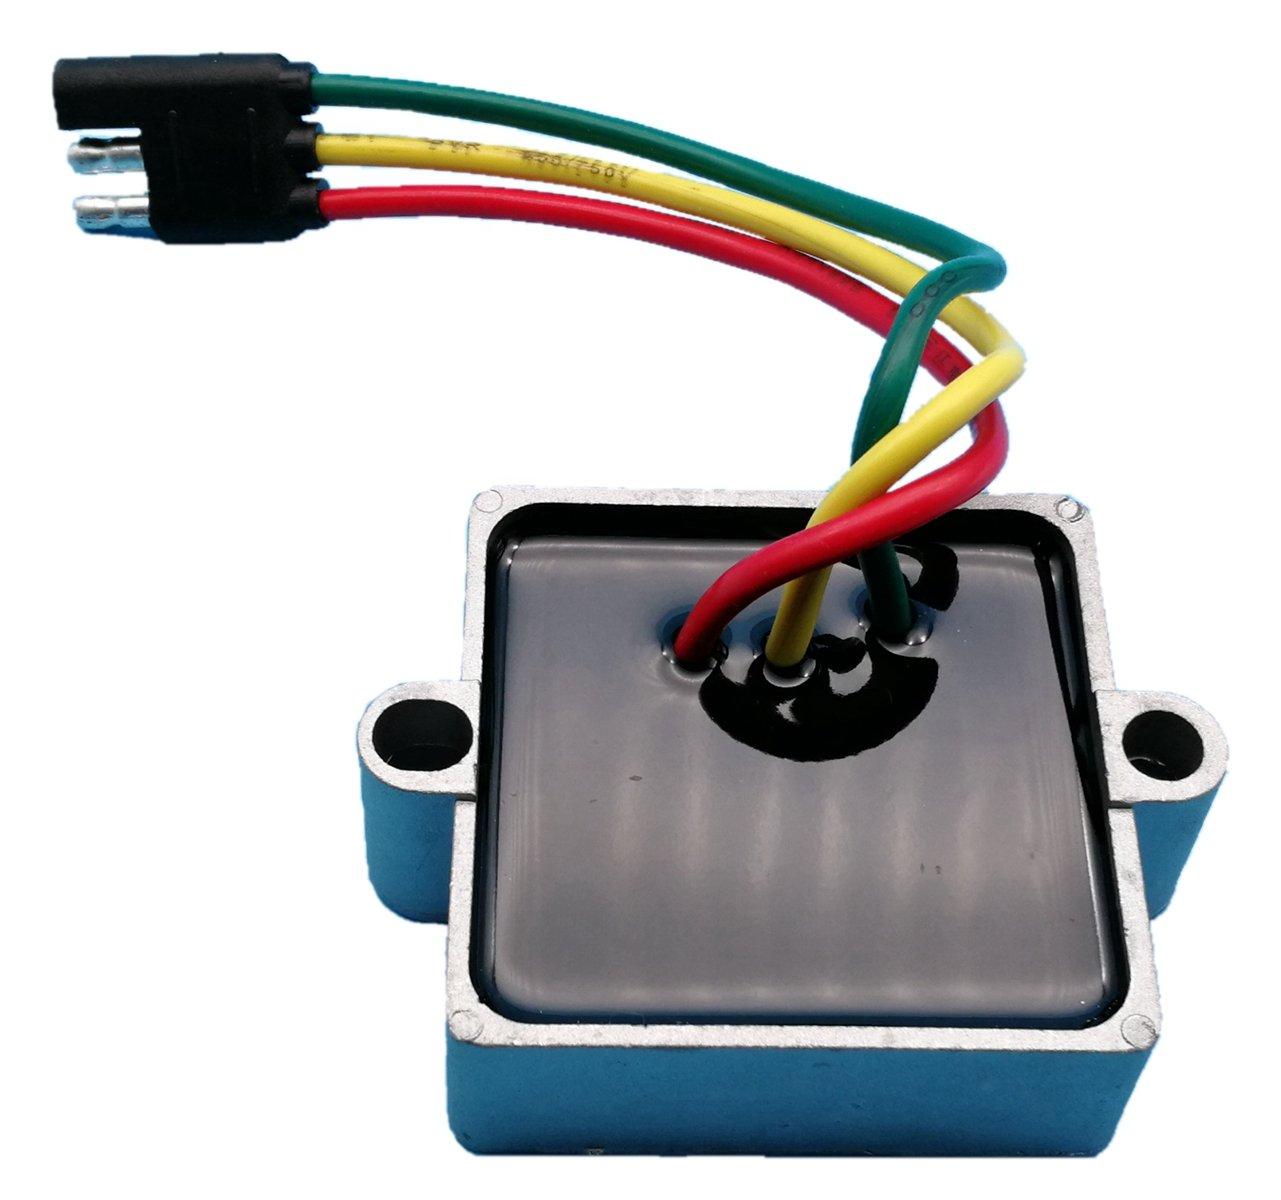 Tuzliufi Voltage Regulator Replace Polaris Snowmobile Classic Trail Touring Widetrak XC SP Edge Supersport RMK Rush IQ Switchback 340 500 550 600 700 800 2002-2015 Repl 4010794 4010355 4011809 New Z46 Generic